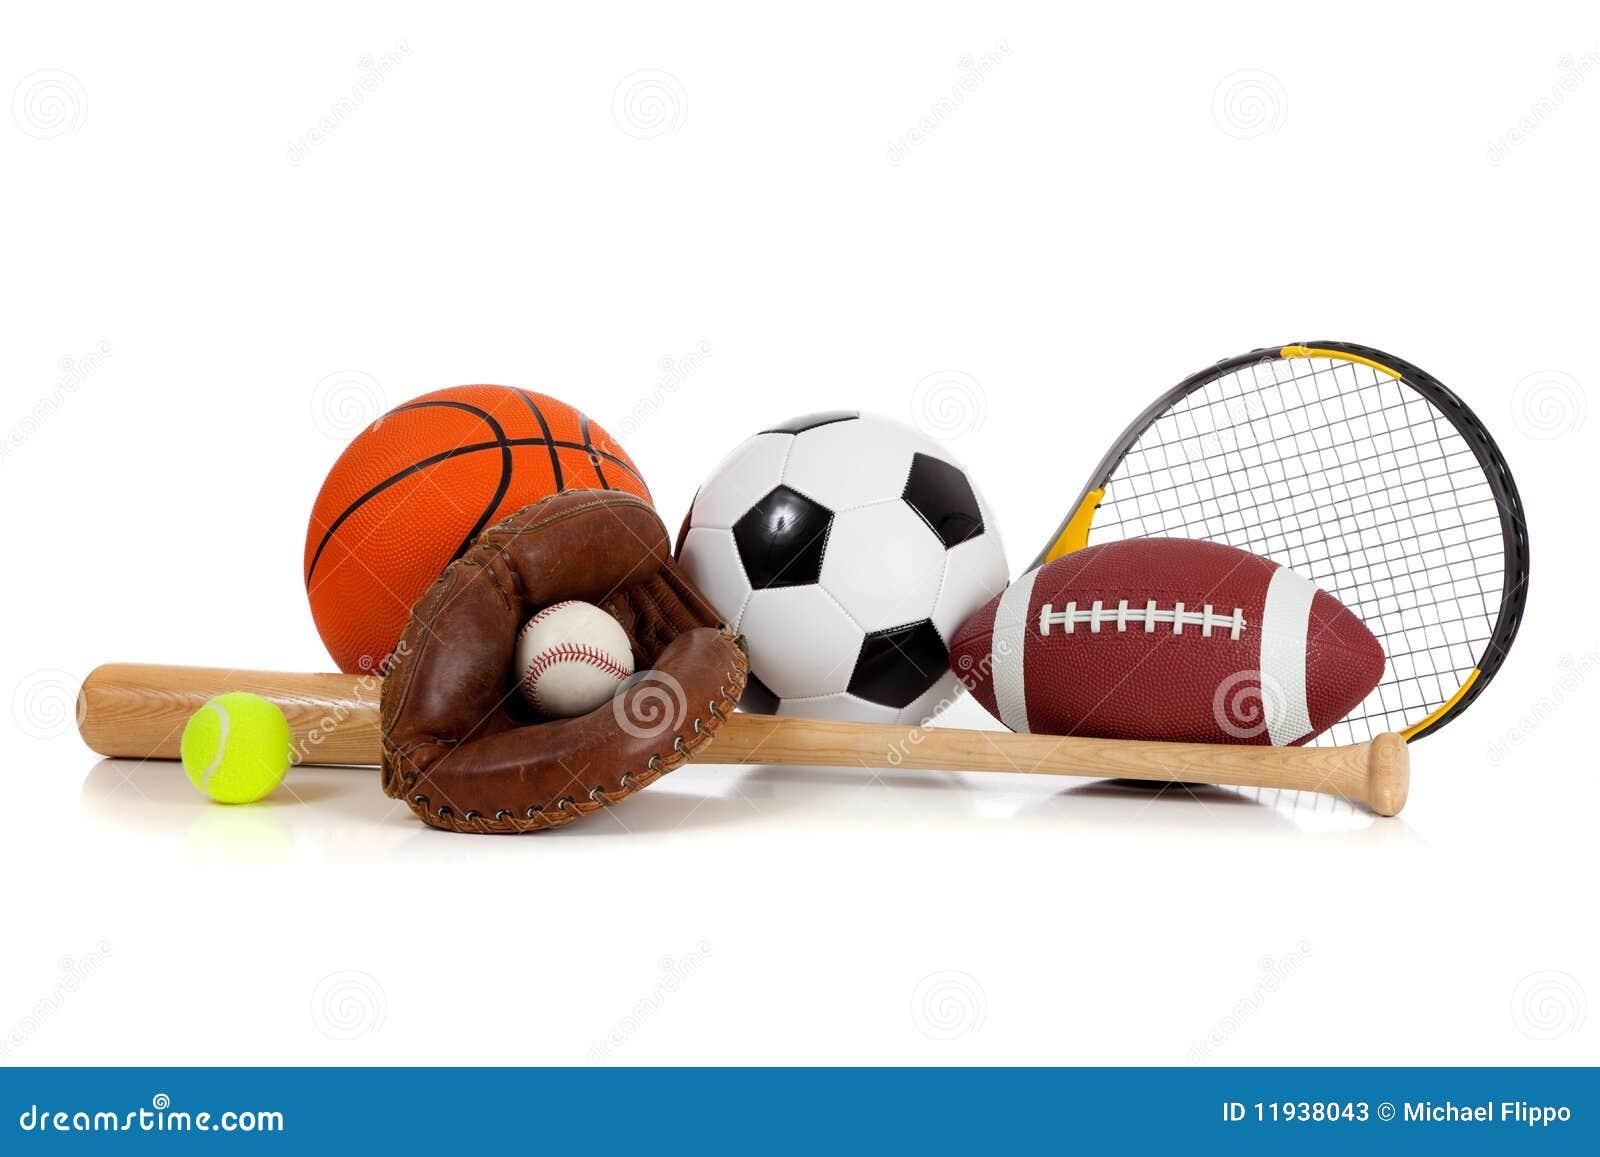 Sporting Goods Equipment ~ Assorted sports equipment on white stock image